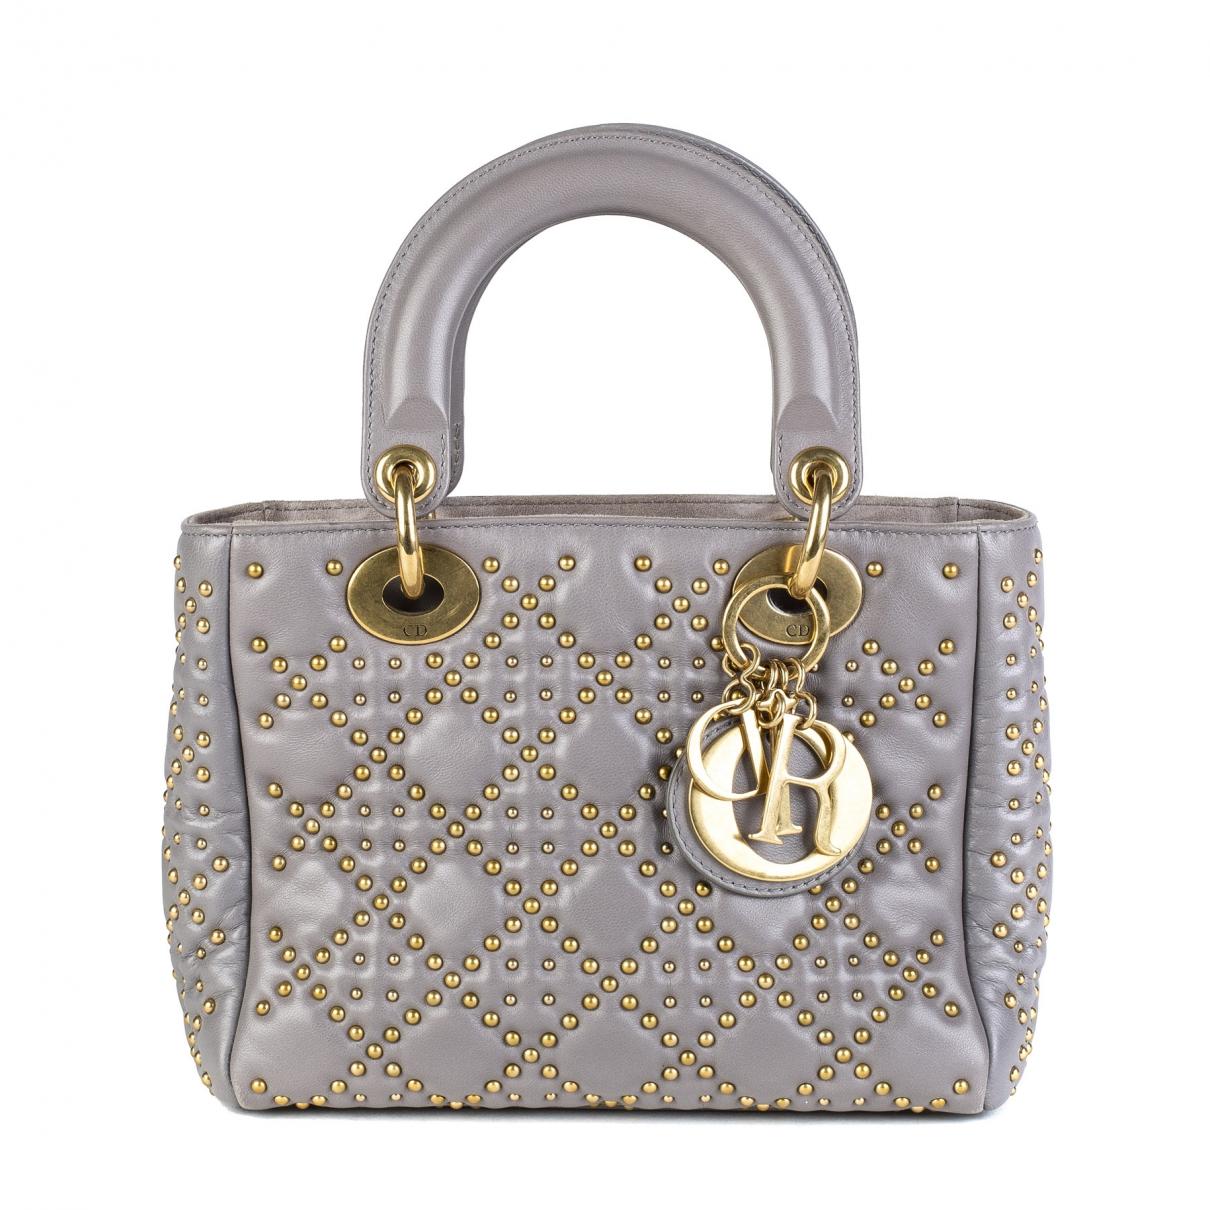 Dior Lady Dior Handtasche in  Grau Leder